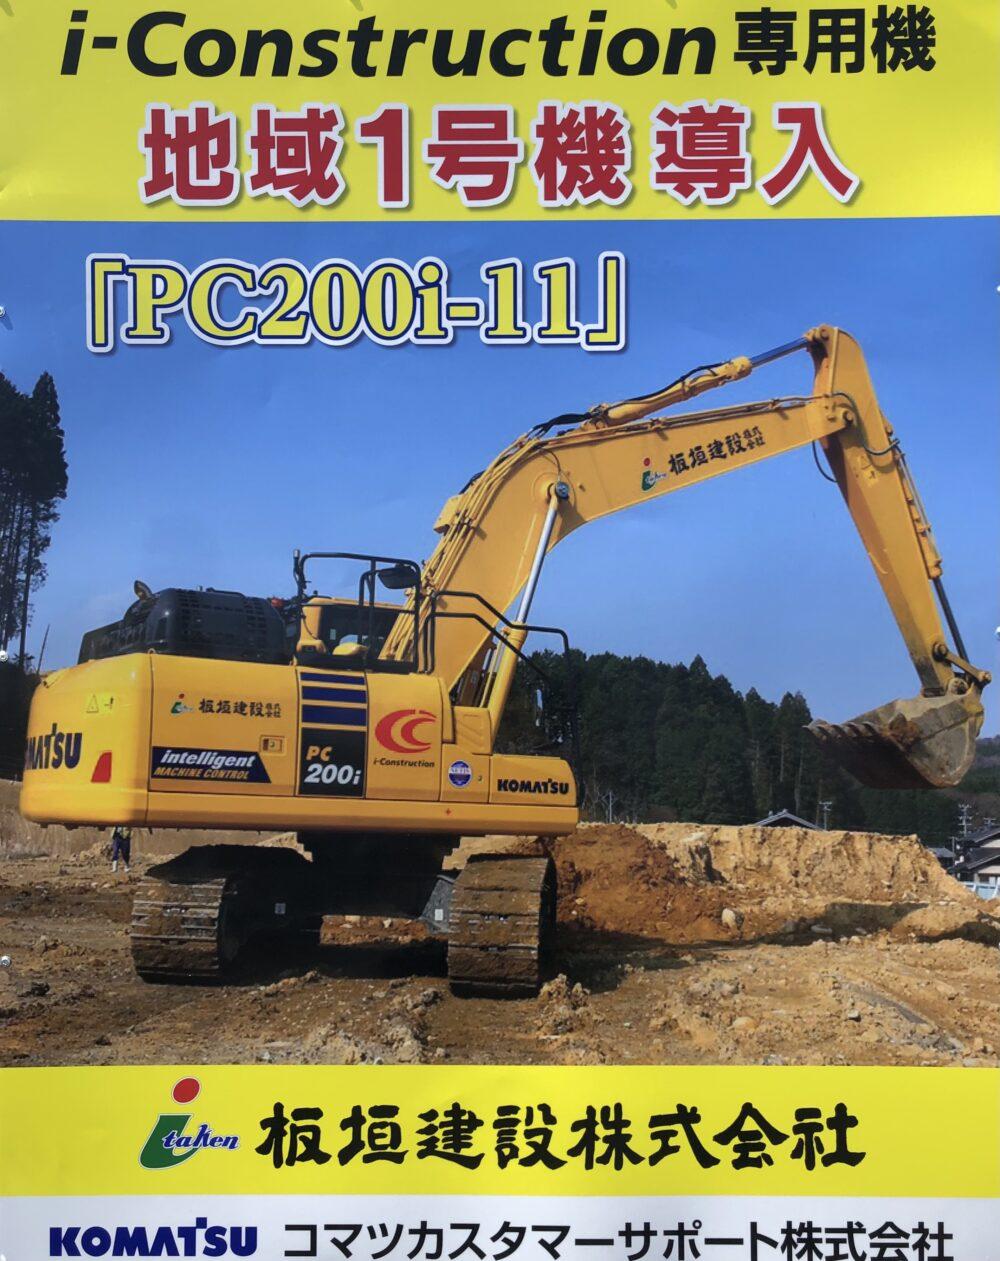 i-Construction専用機